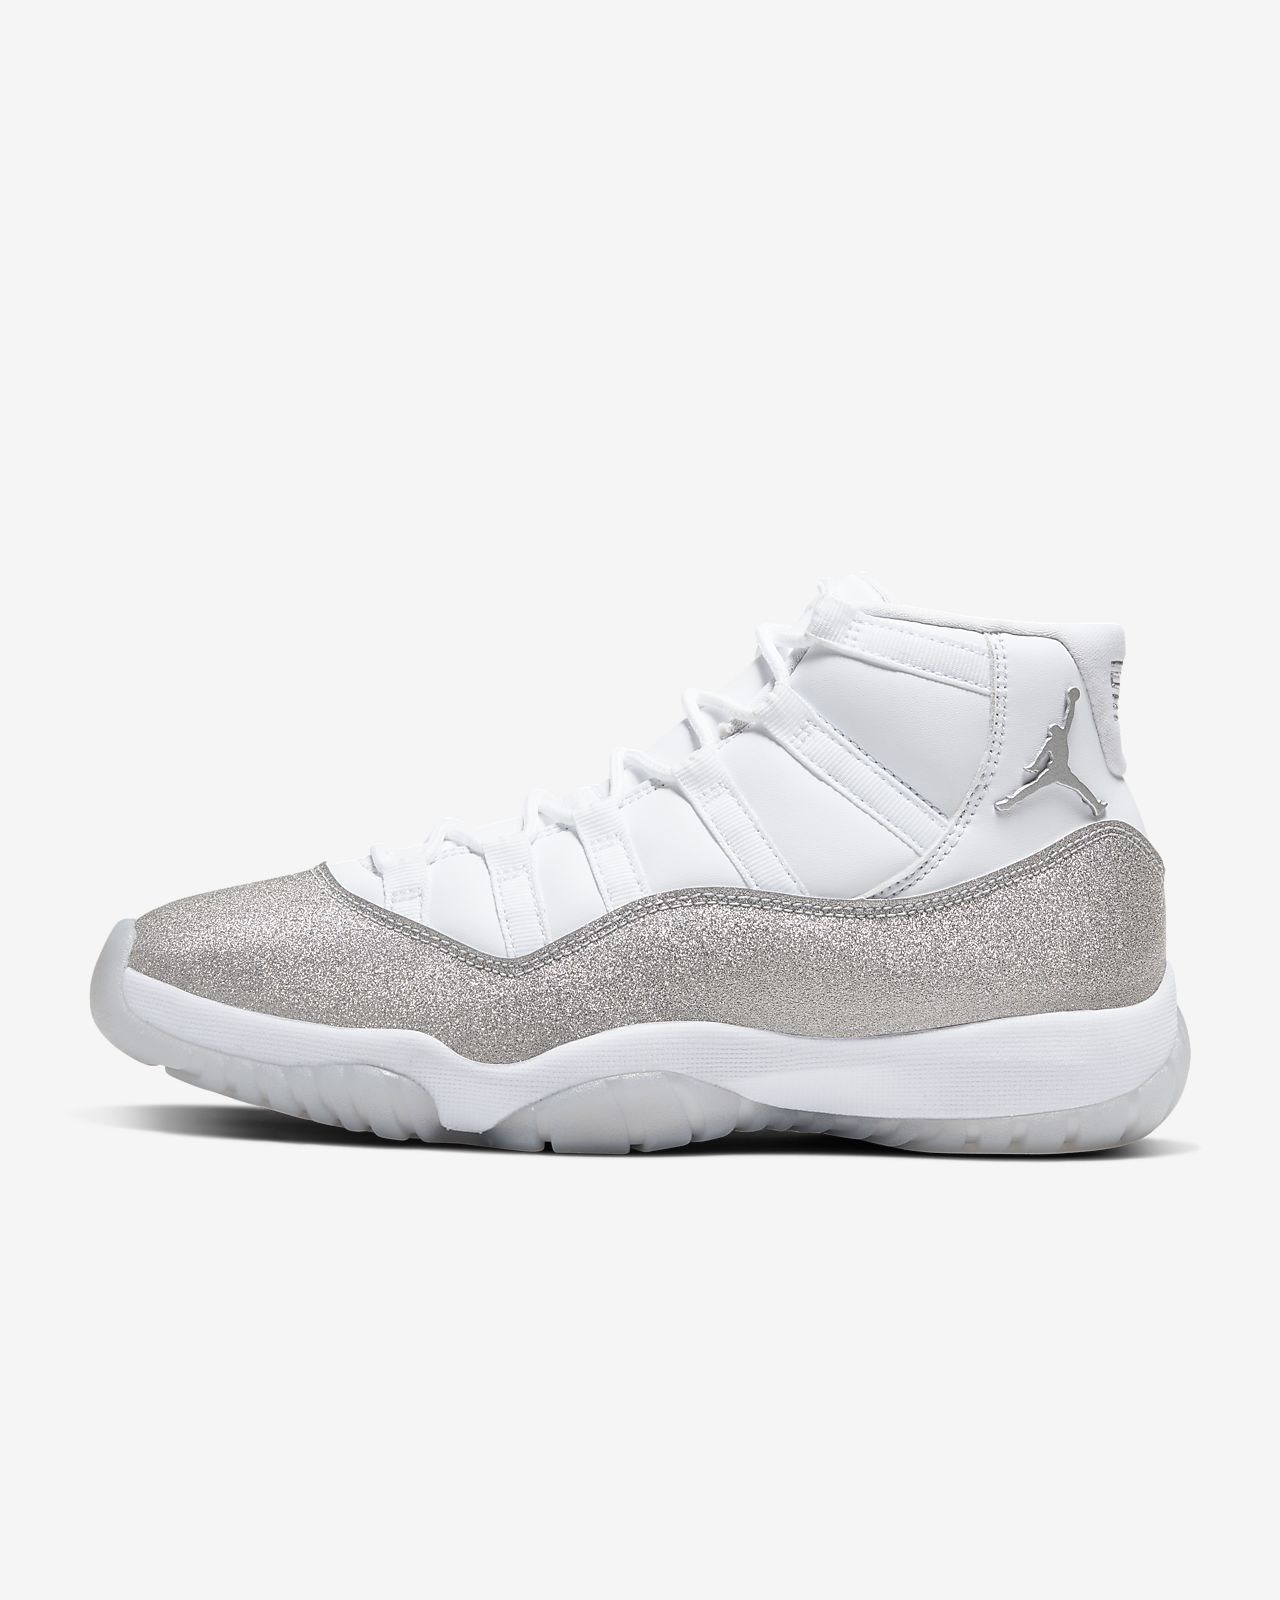 Air Jordan 11 Retro Shoe